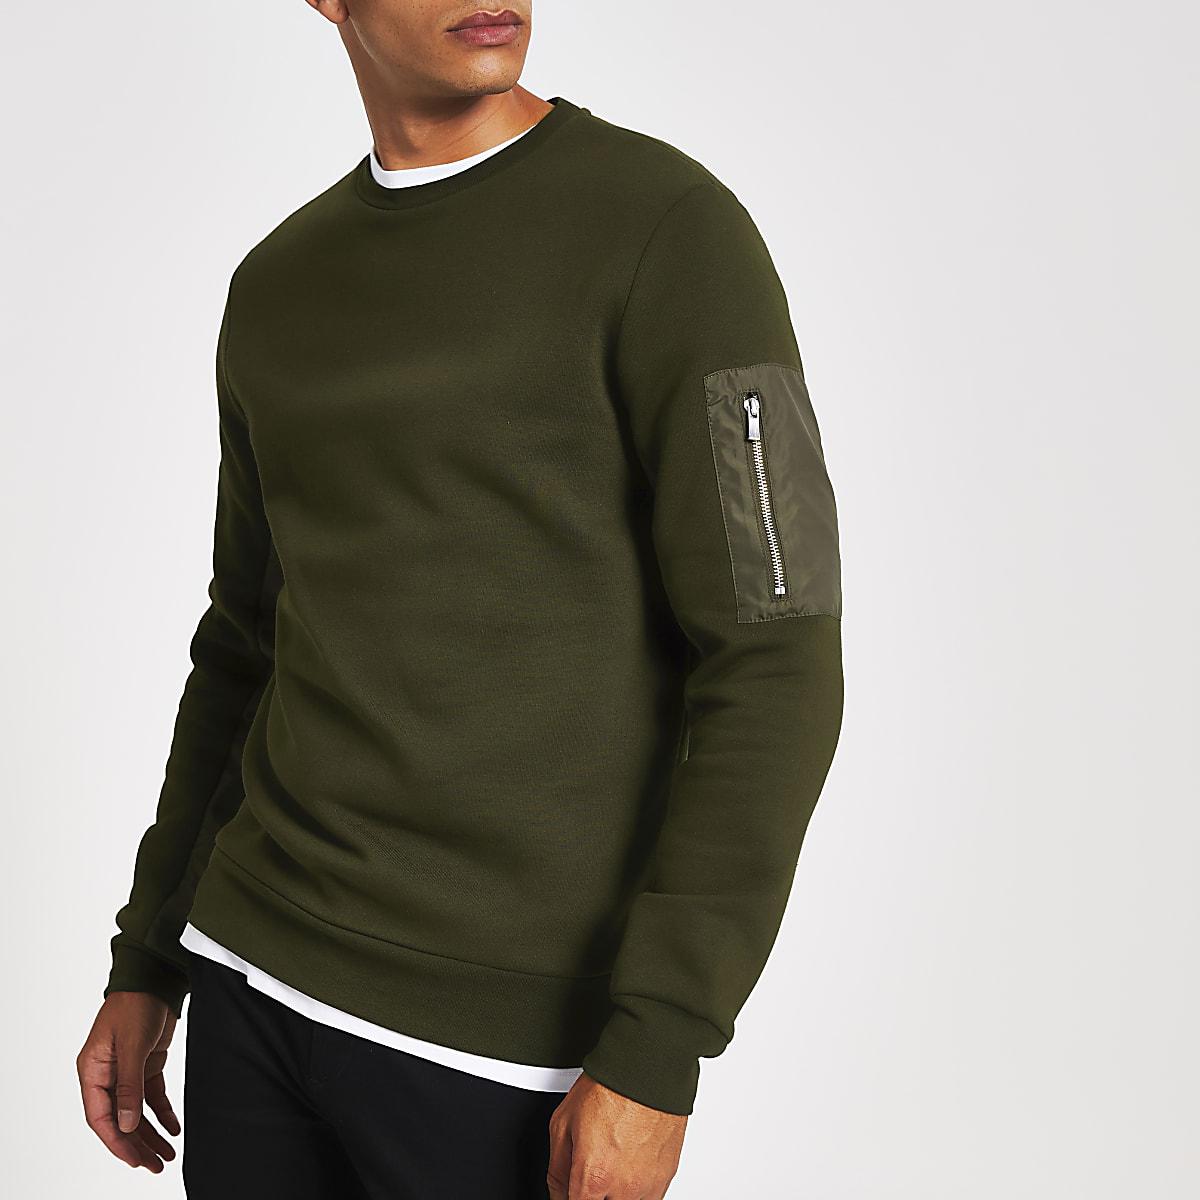 Khaki slim fit utility sweatshirt